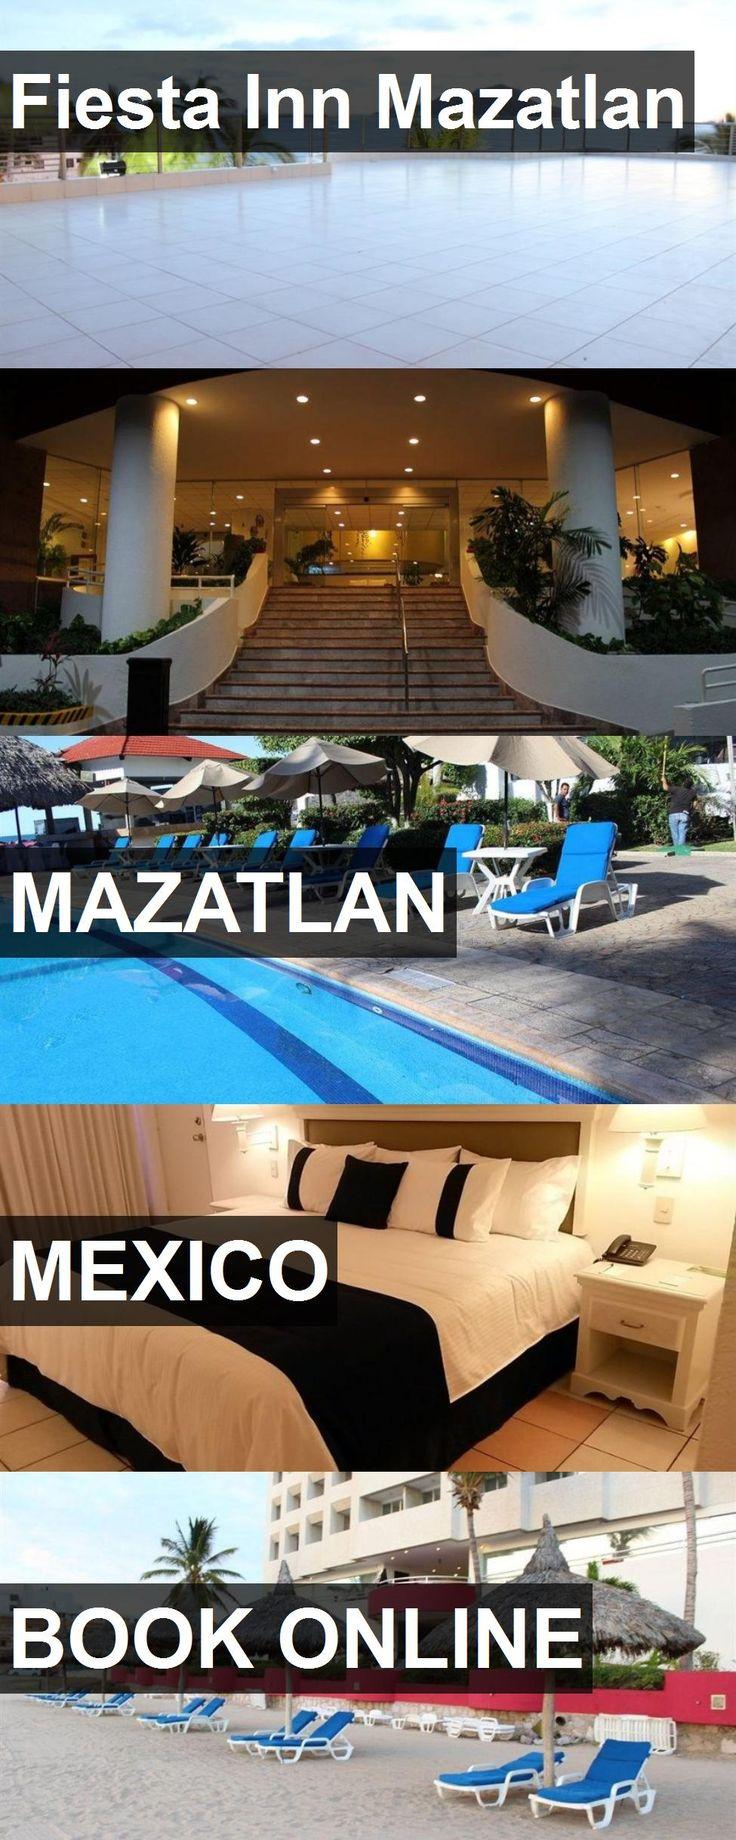 Hotel Fiesta Inn Mazatlan in Mazatlan, Mexico. For more information, photos, reviews and best prices please follow the link. #Mexico #Mazatlan #travel #vacation #hotel